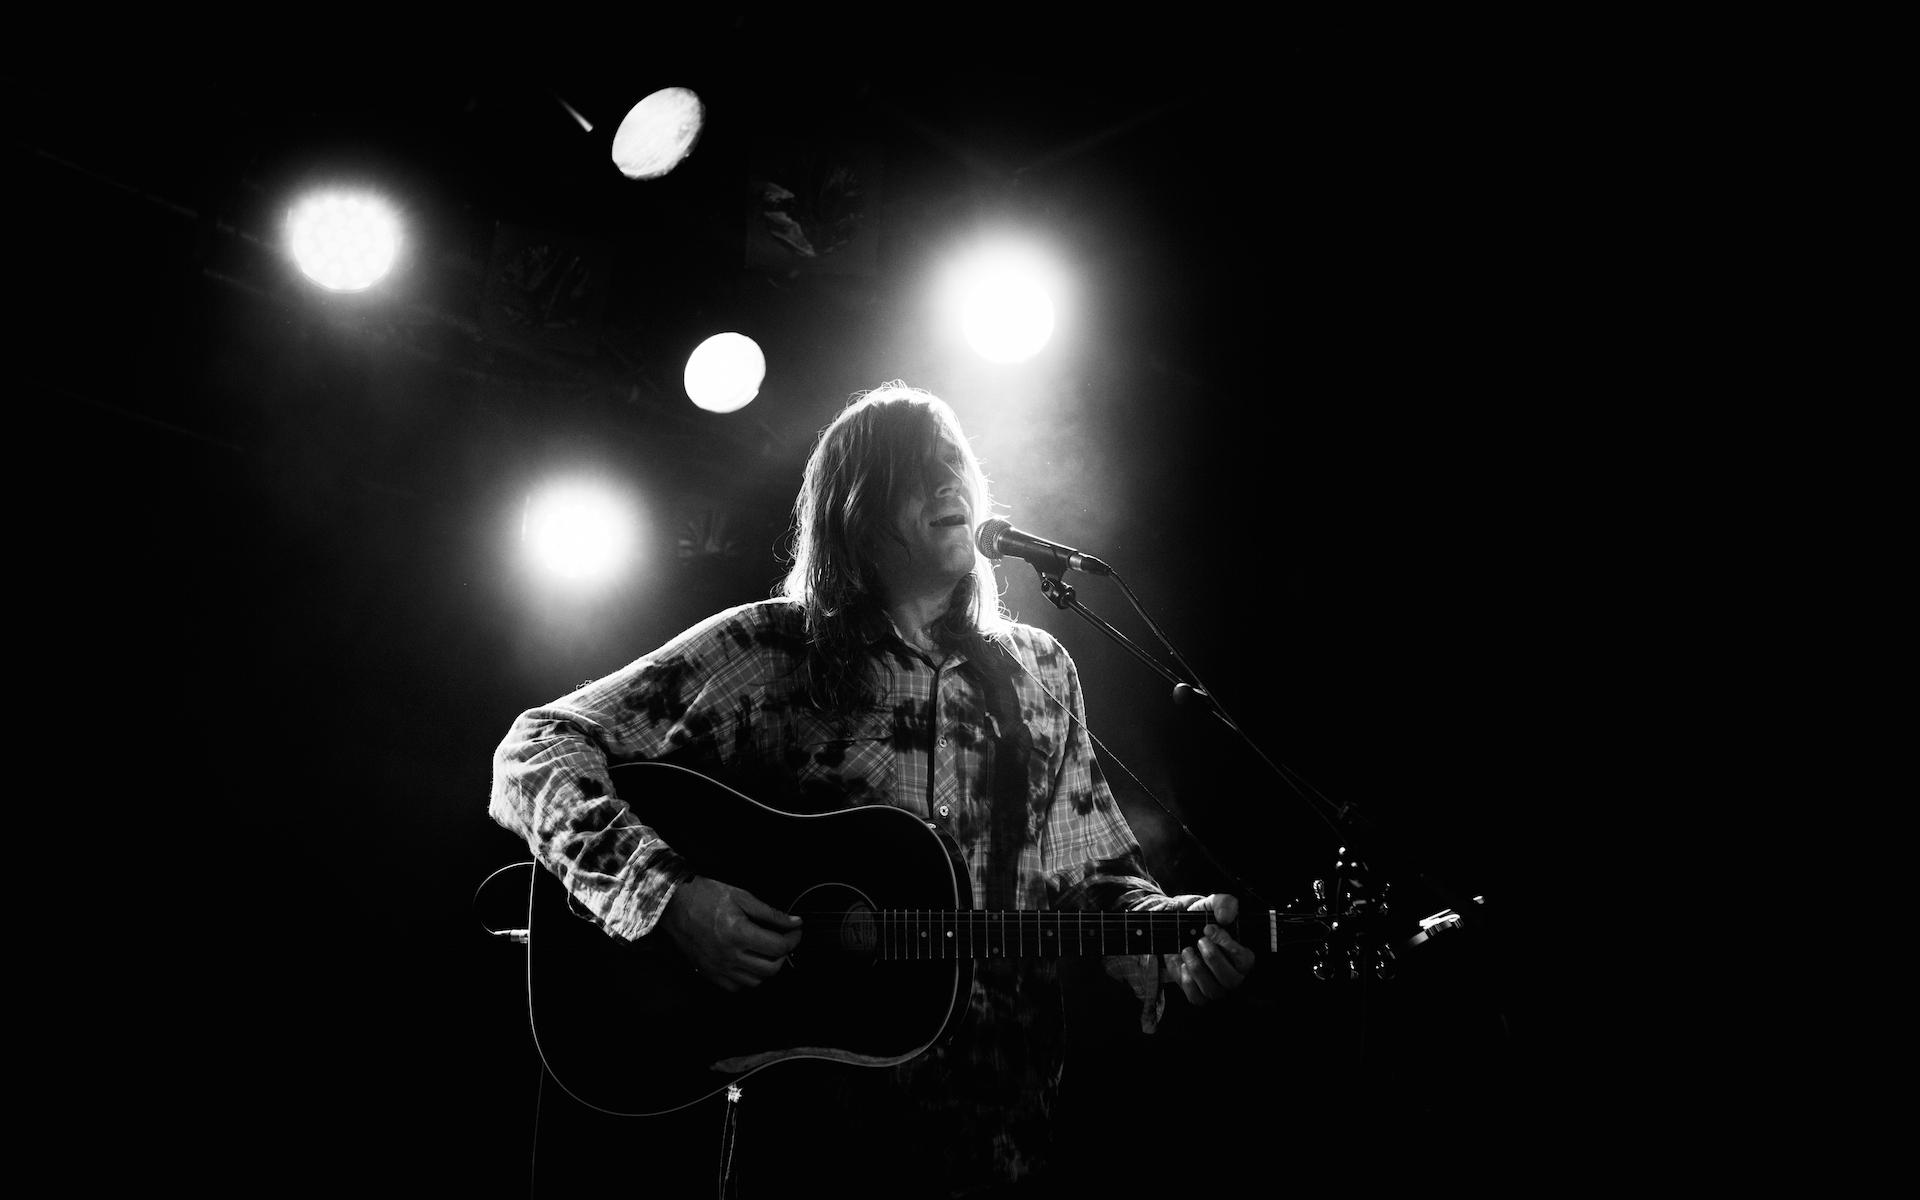 Evan Dando (Lemonheads) on Songwriting, Guitars, and Mrs. Robinson